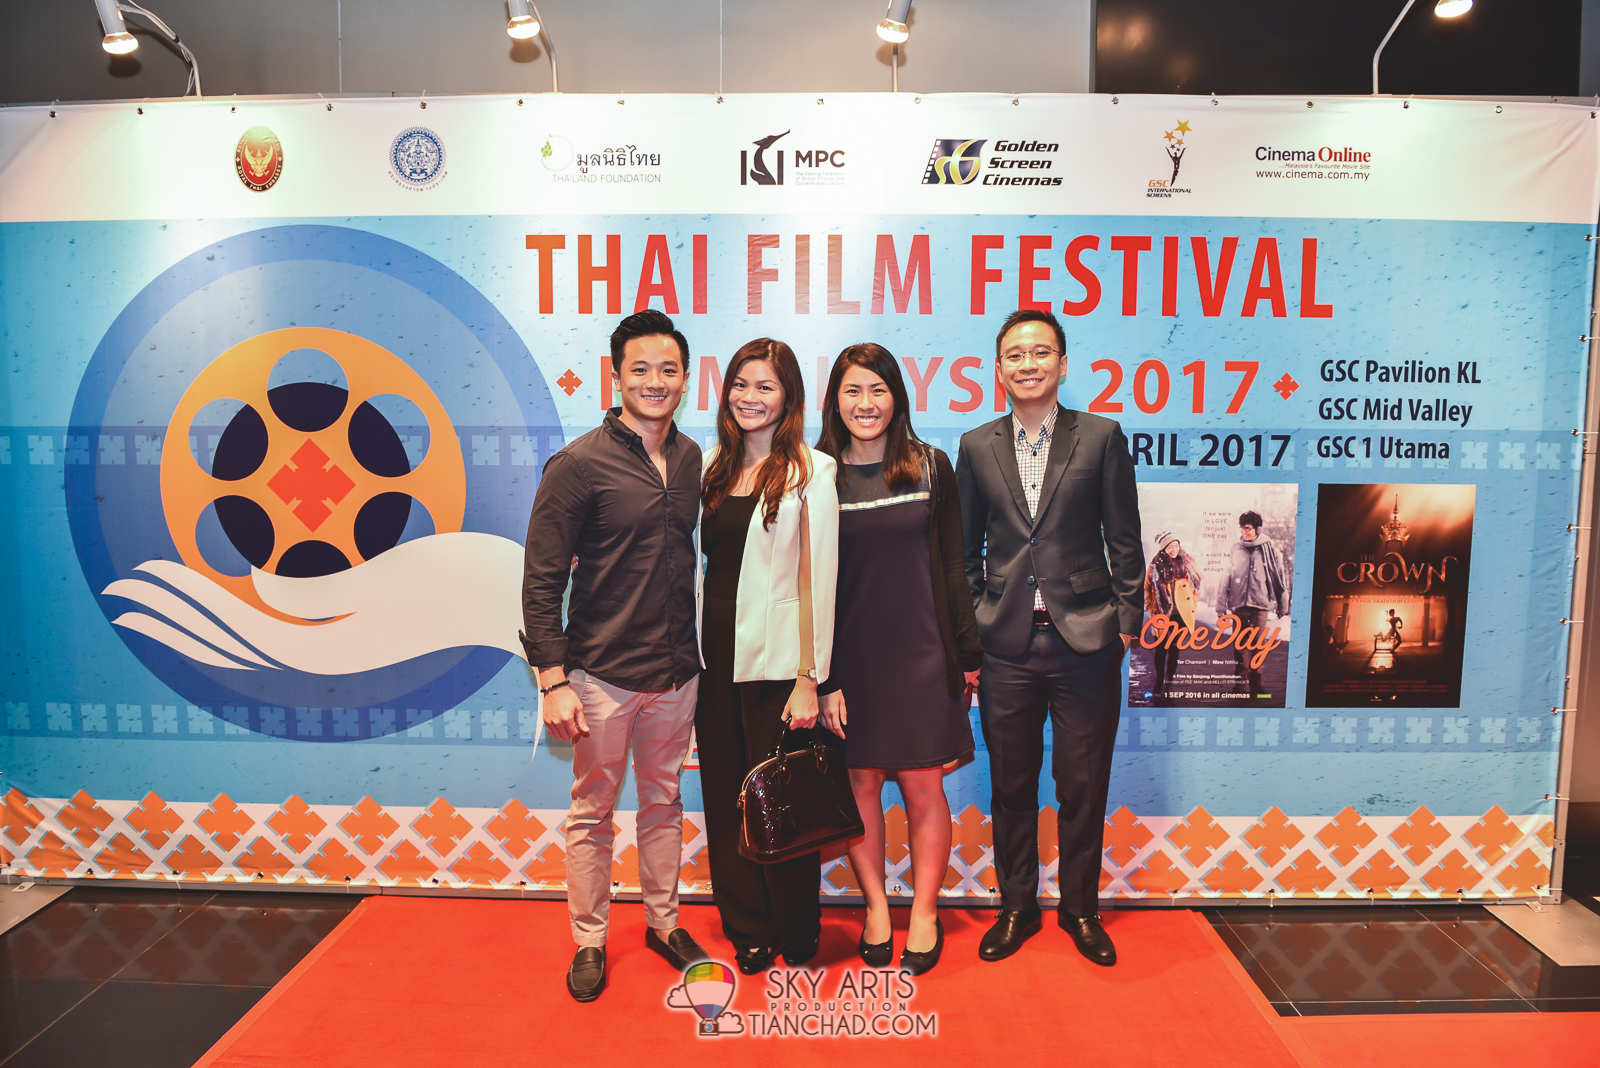 Thai Film Festival in Malaysia 2017 GSC Pavilion KL - Note Panayanggool,  Ittisak Eusunthornwattana,